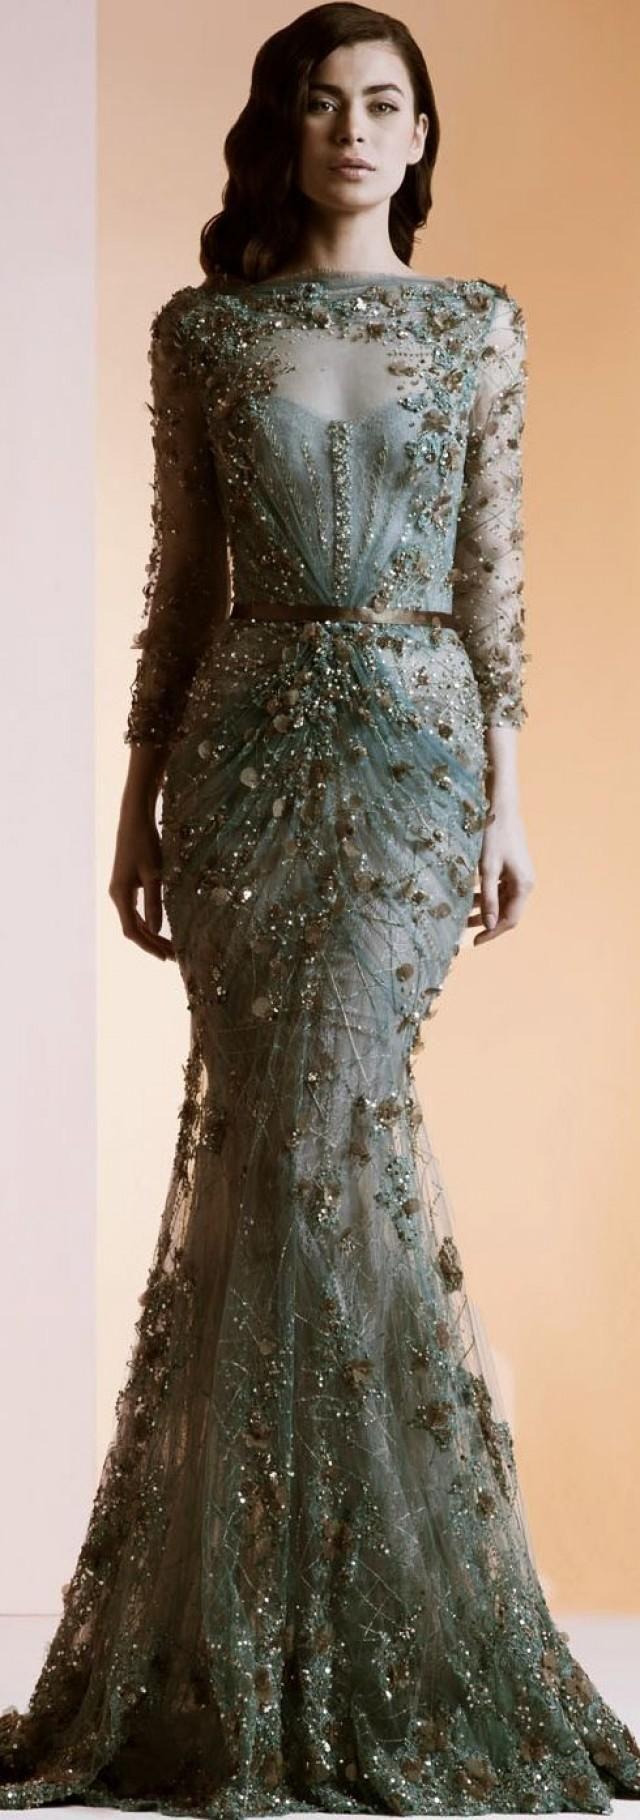 Beautiful beaded pale green cream and gold dress ziad nakad tus